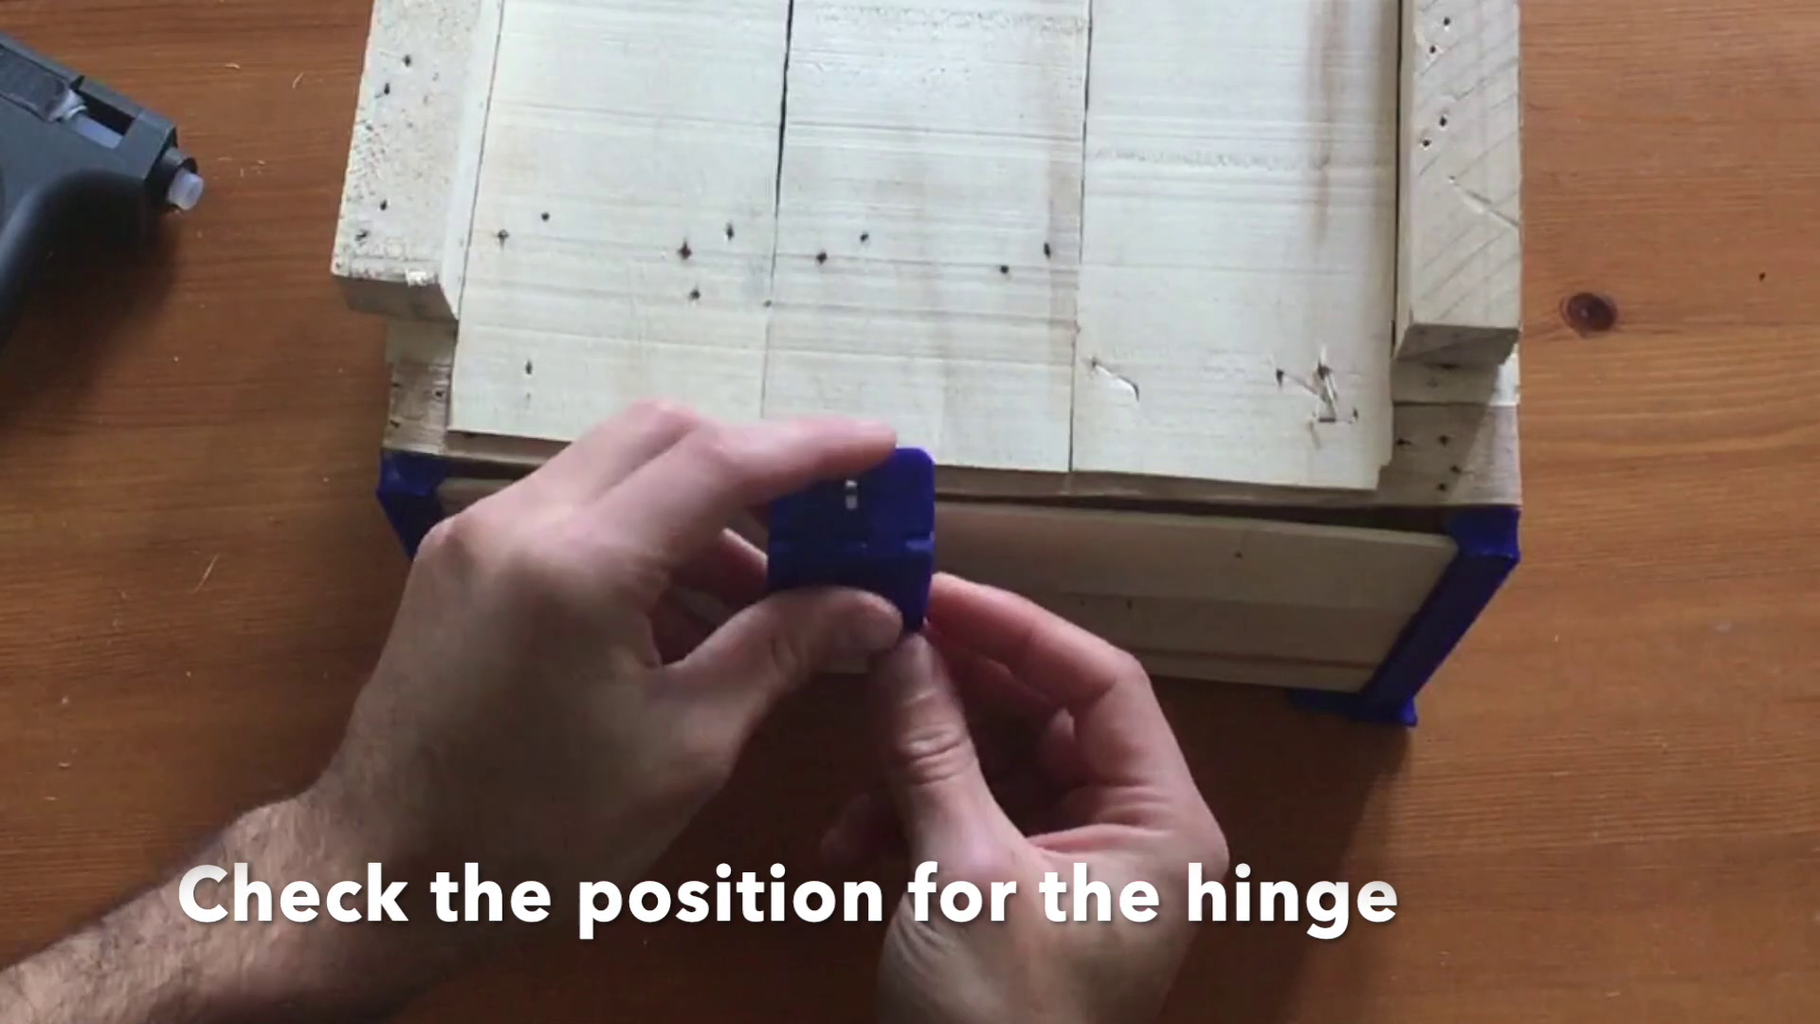 Hot Glue the 3D Printed Parts